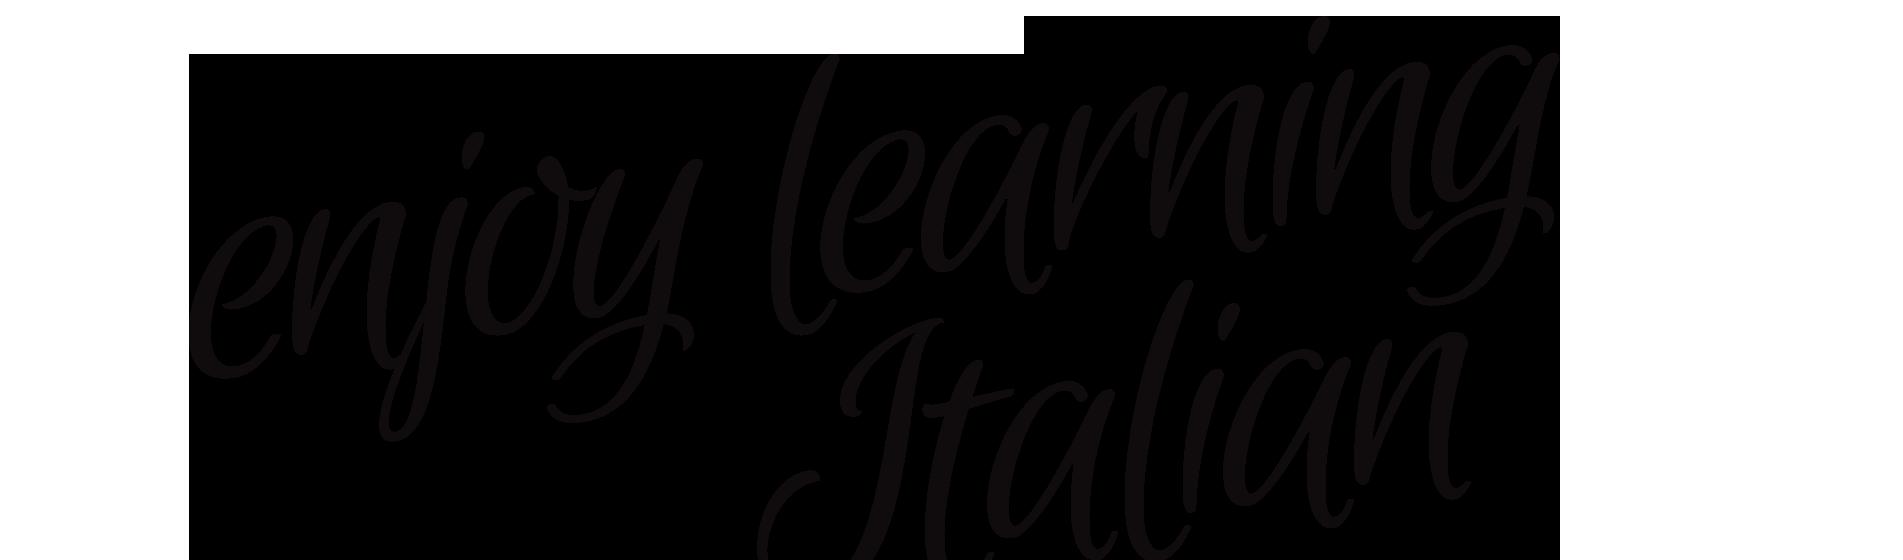 head-line